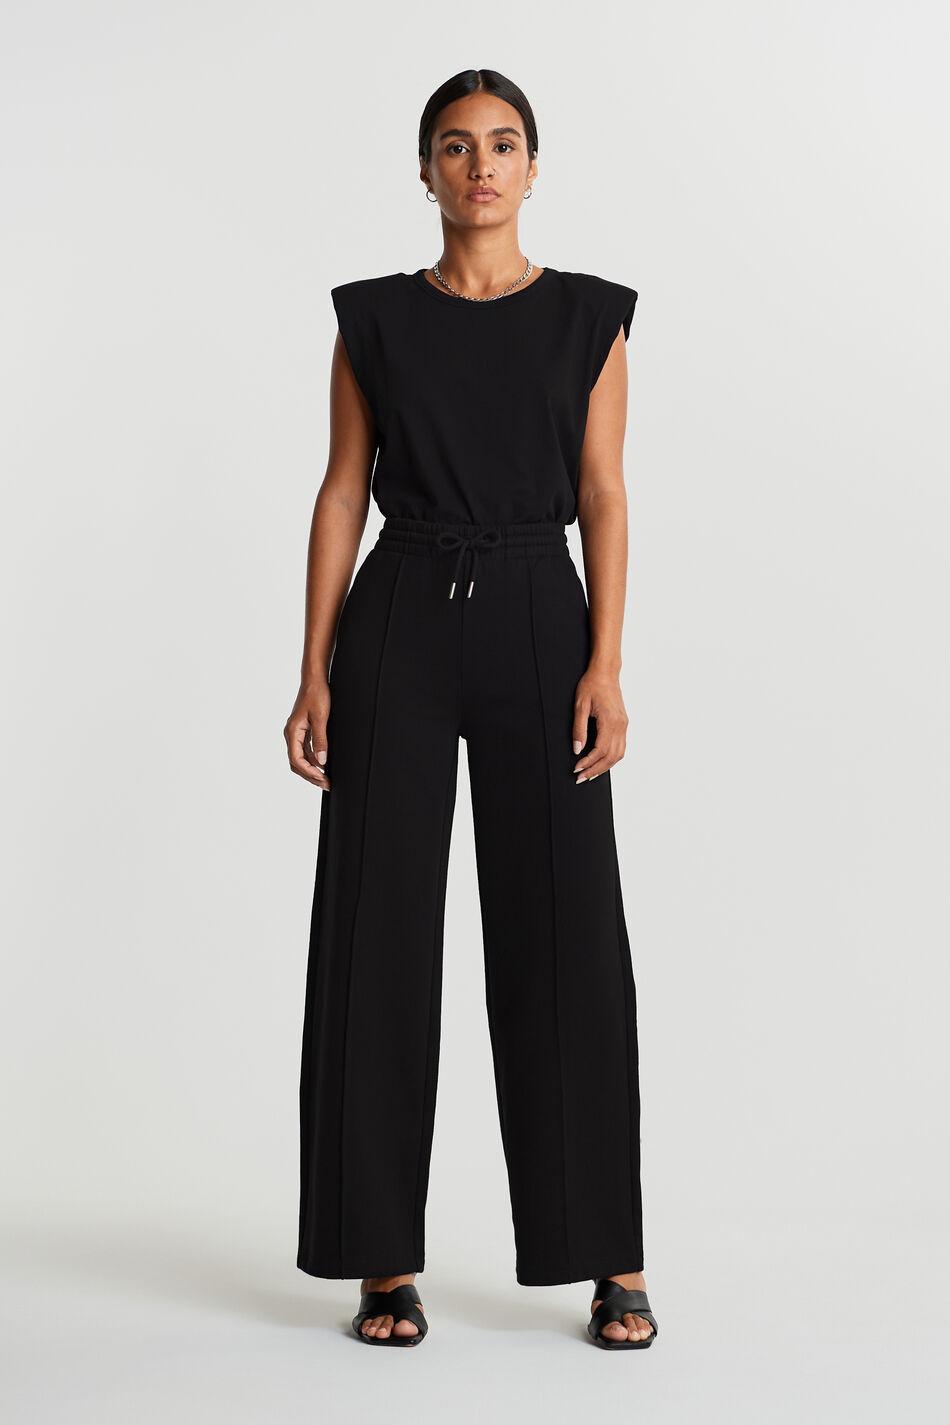 Gina Tricot Bonnie sweatpants M Female Black (9000)